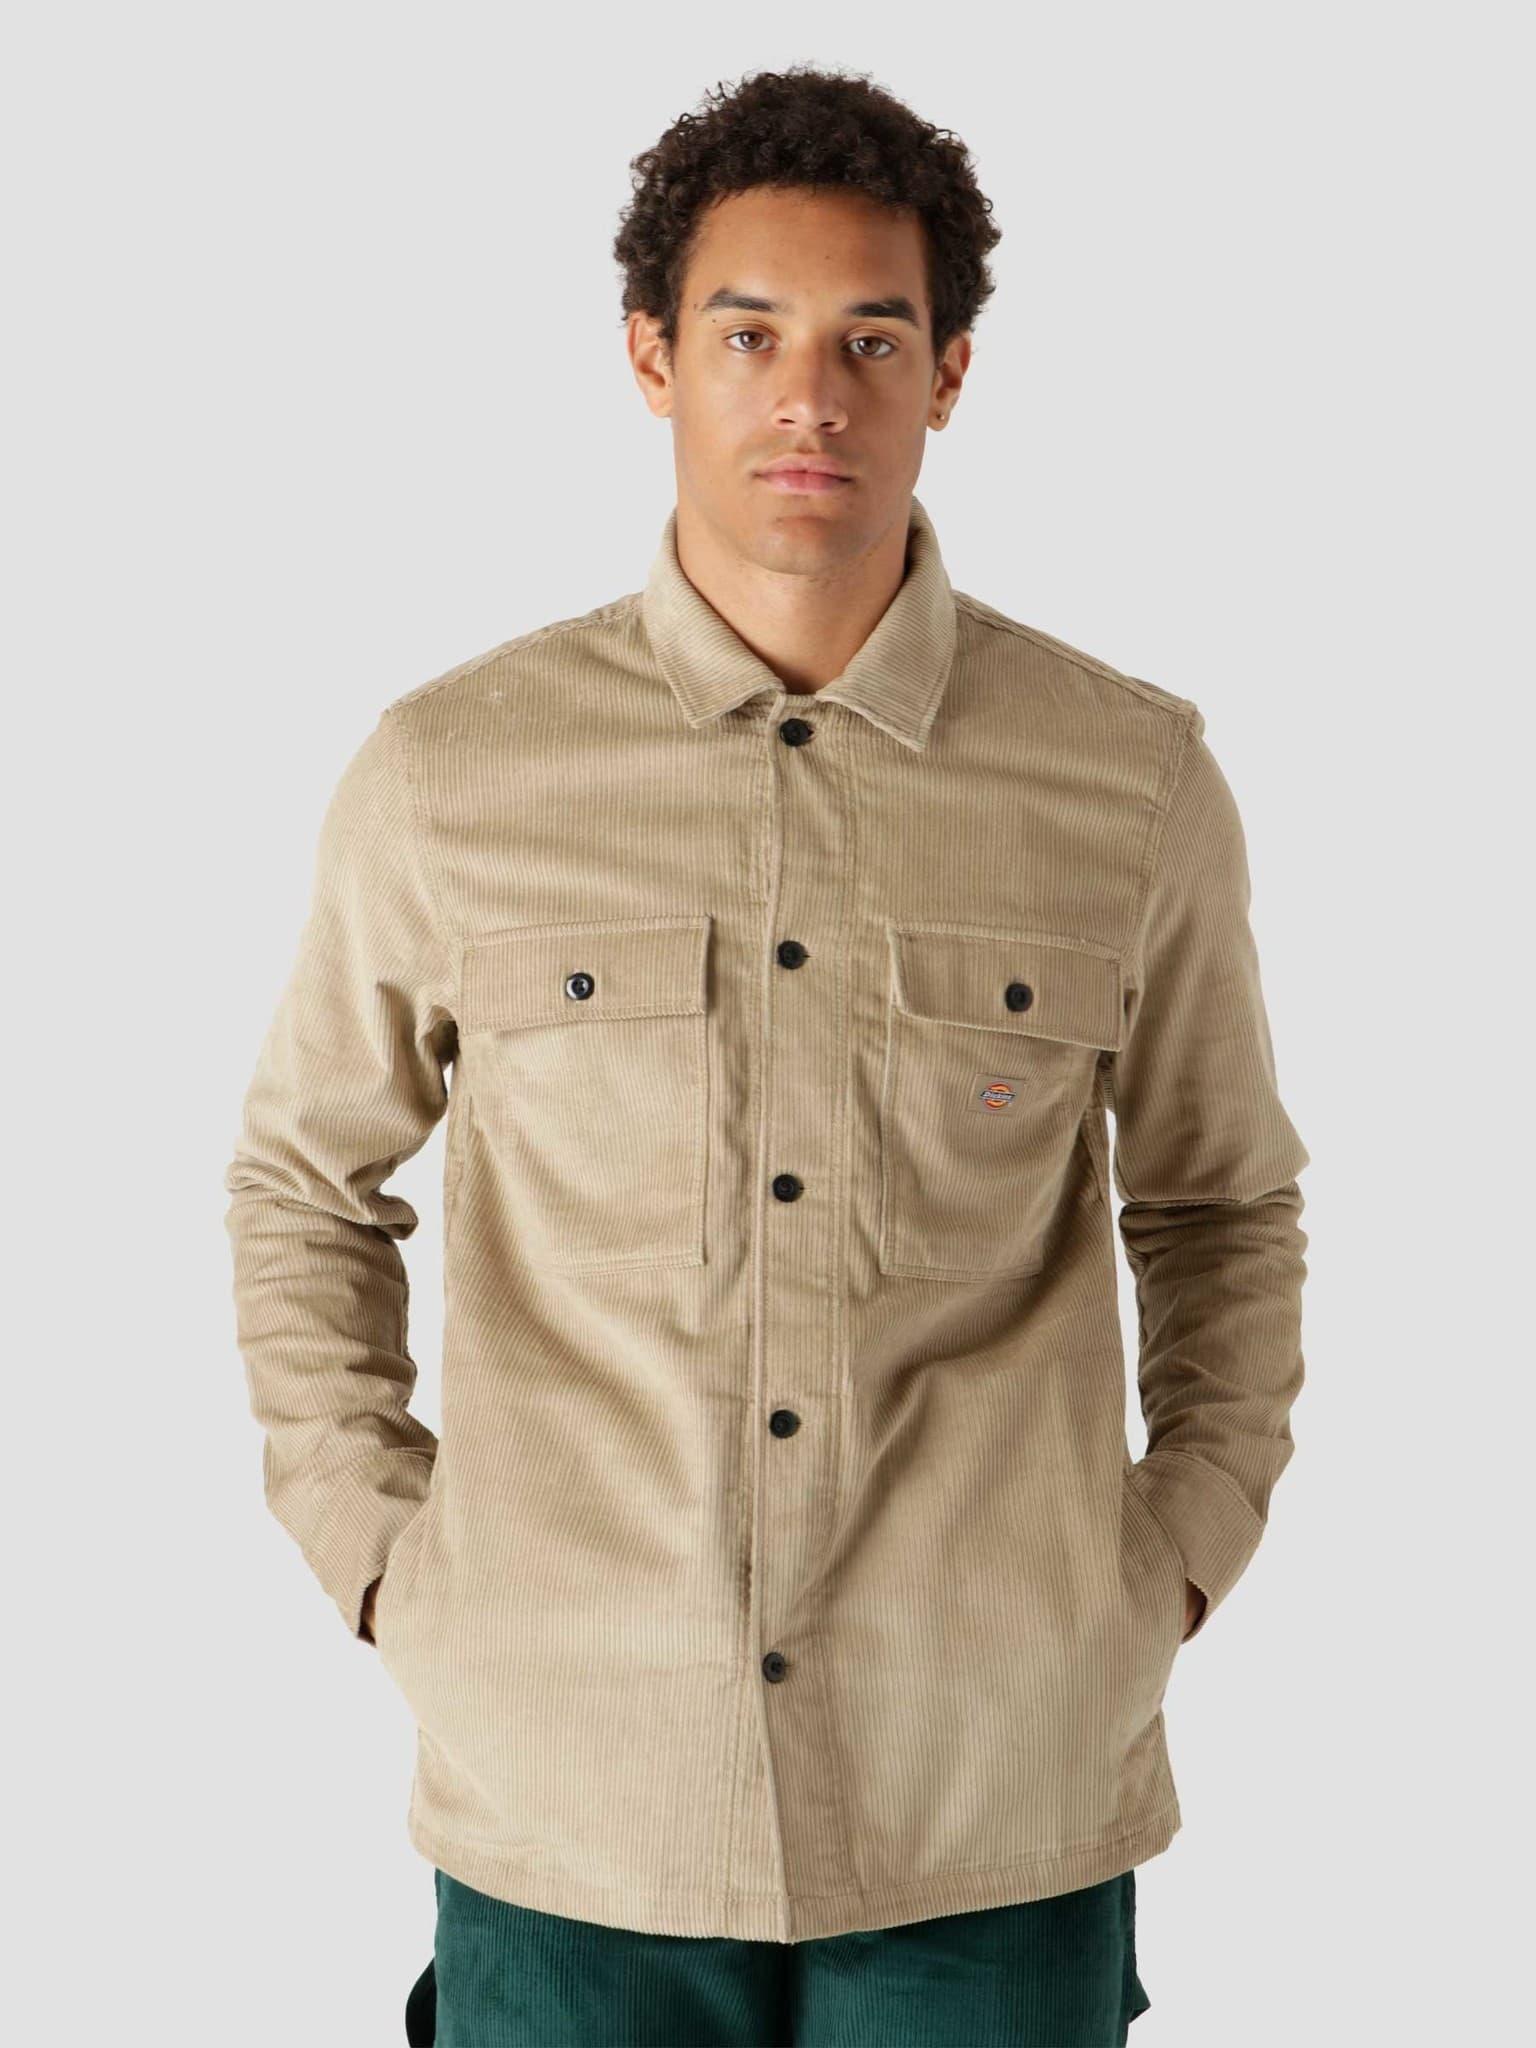 Higginson Shirt Longsleeve Khaki DK0A4XGQKHK